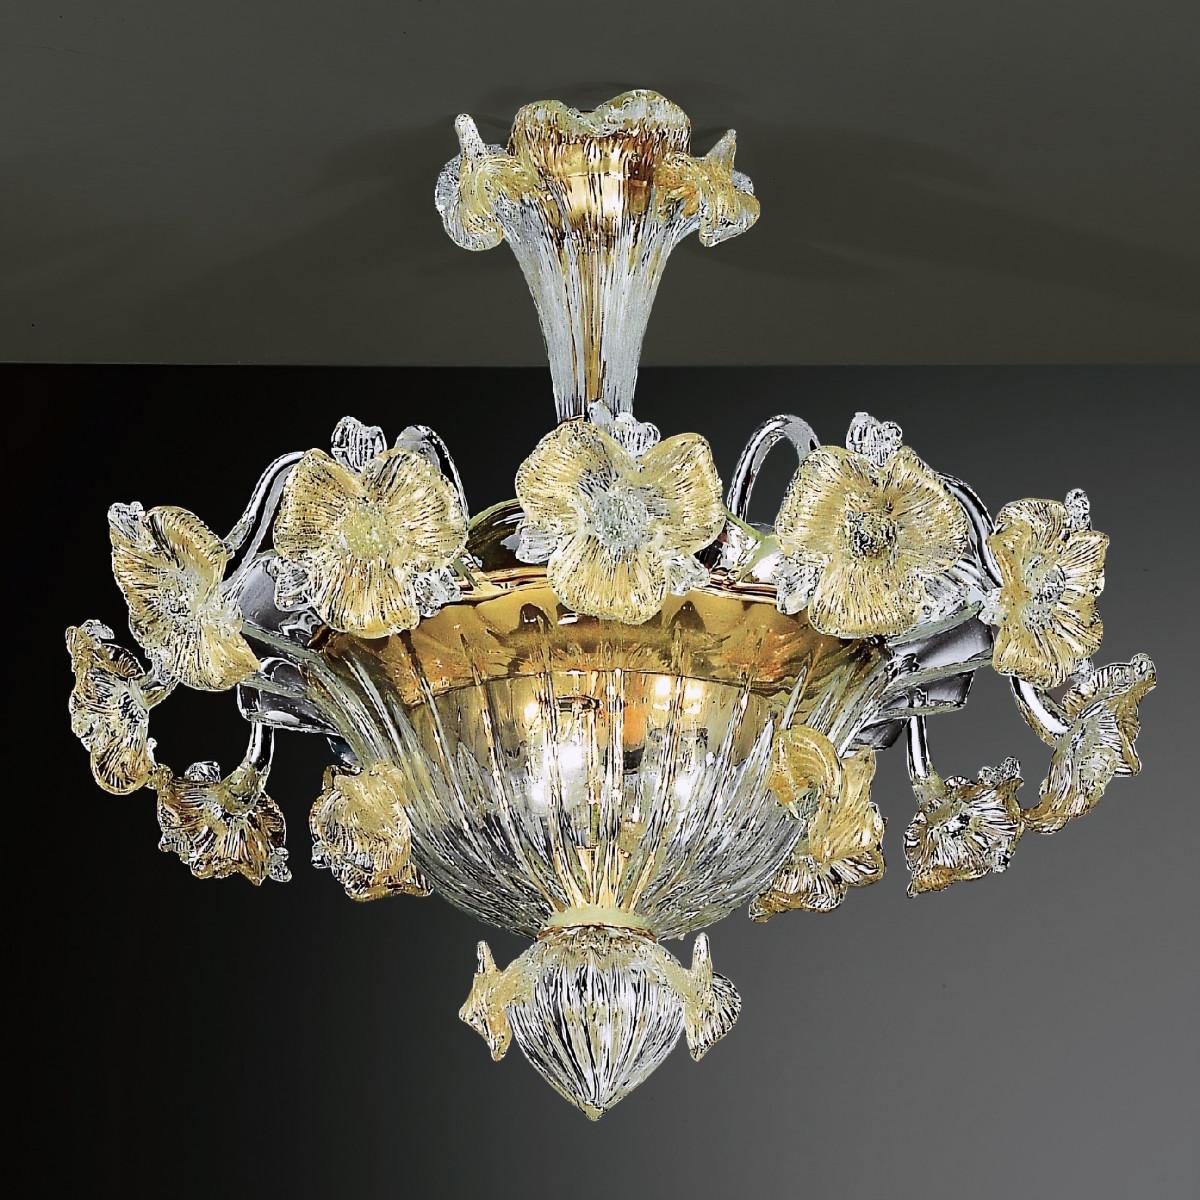 Tiepolo 6 plafonniers Murano lampe d'or couleur transparente